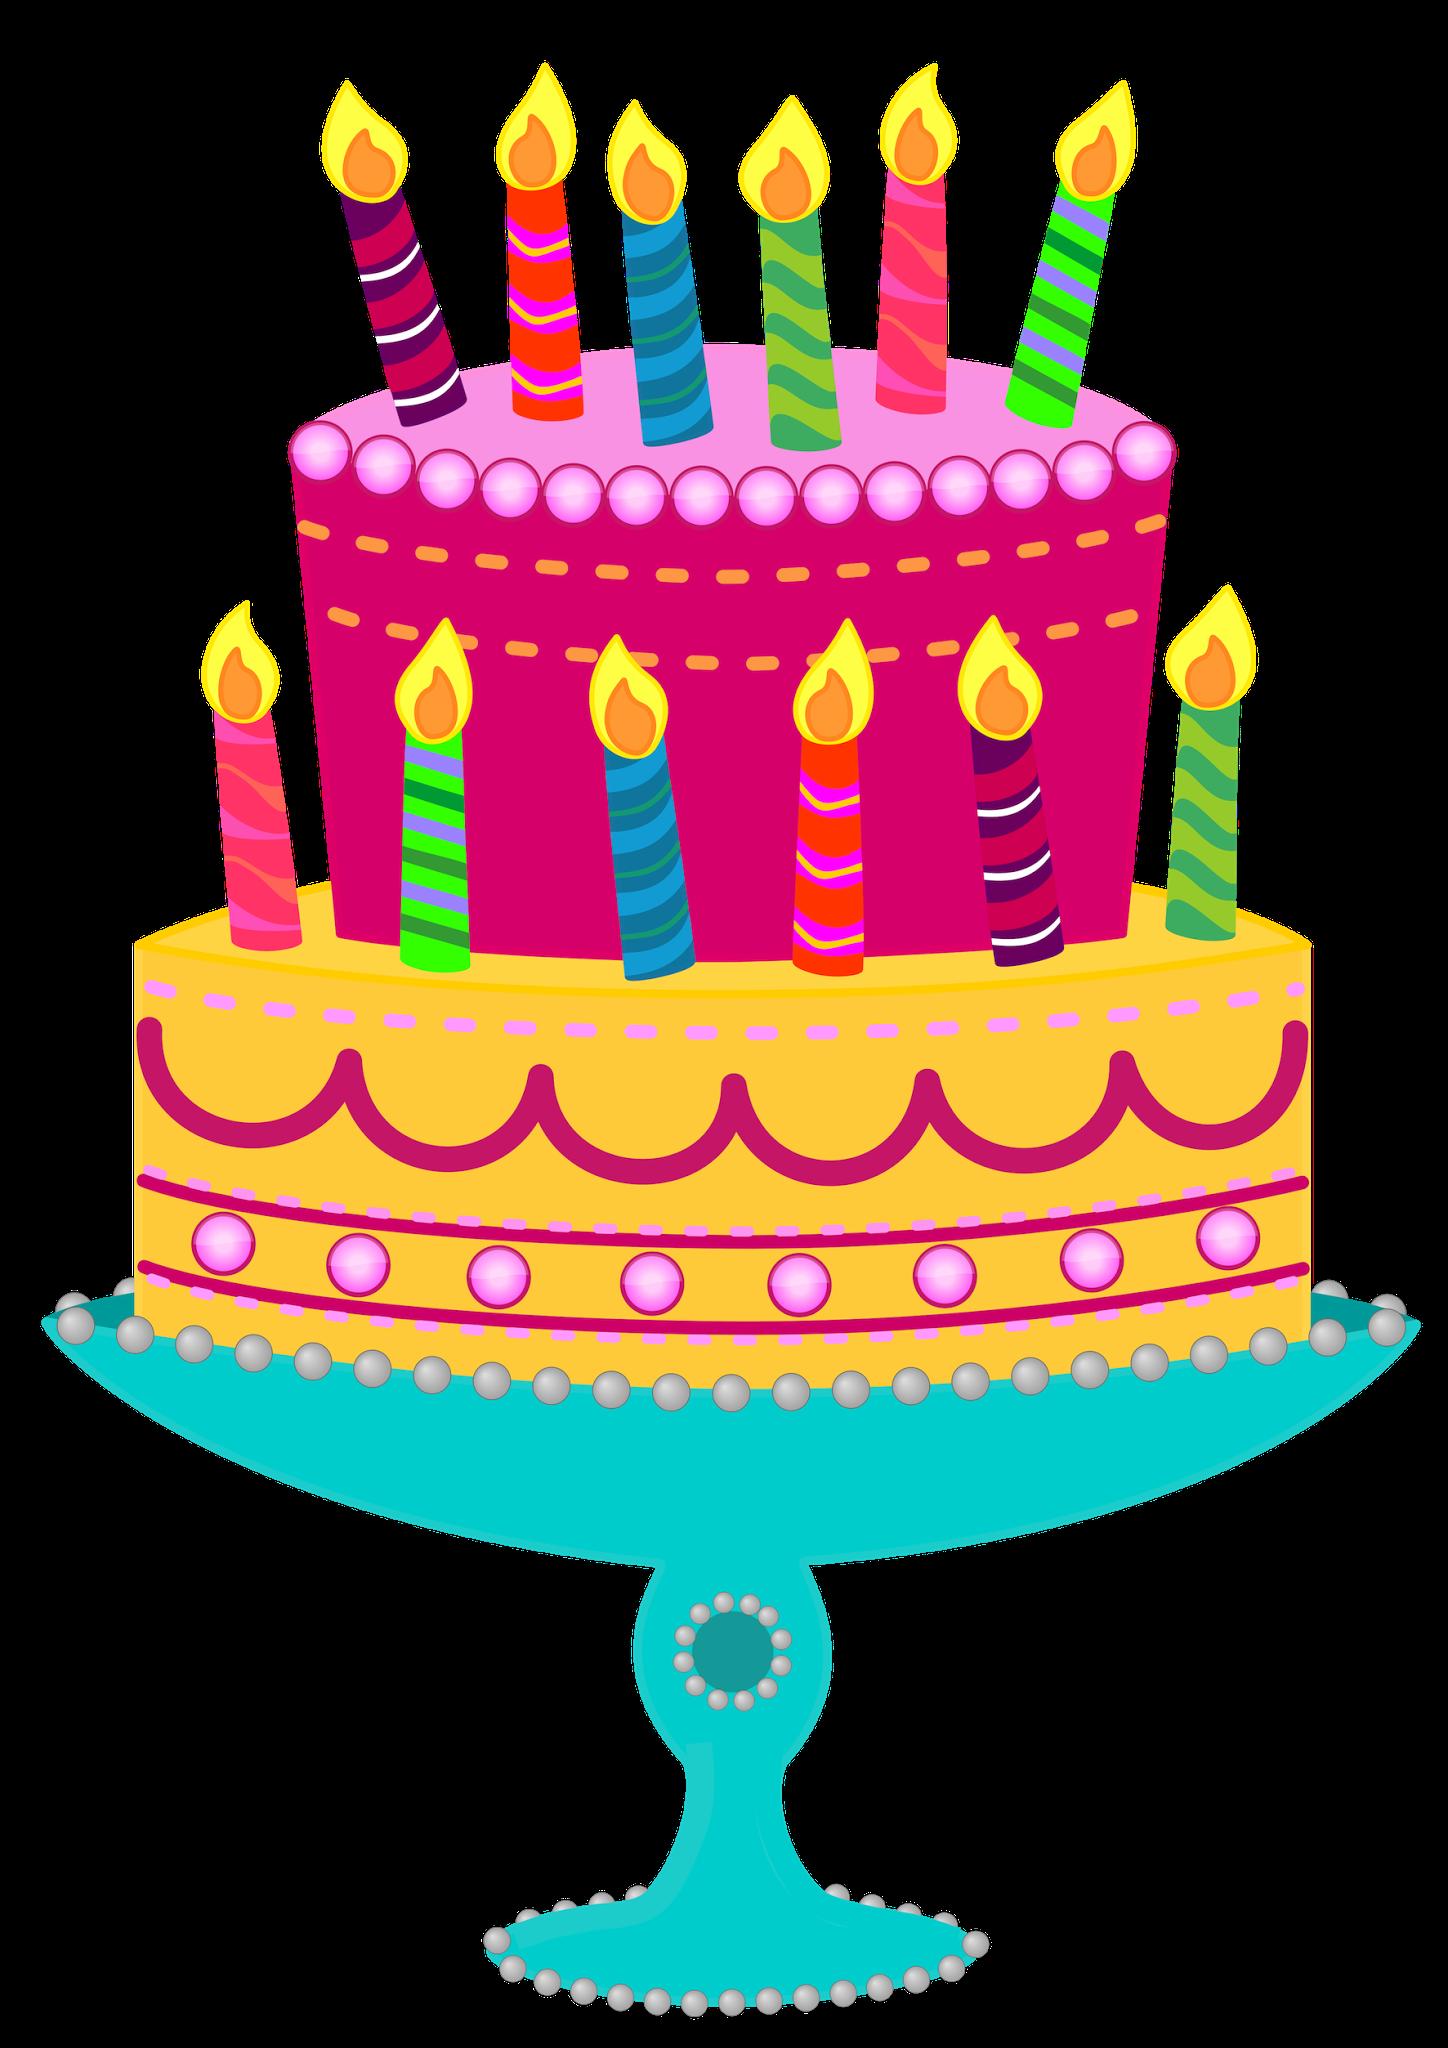 Birthday Cake Clipart-birthday cake clipart-7